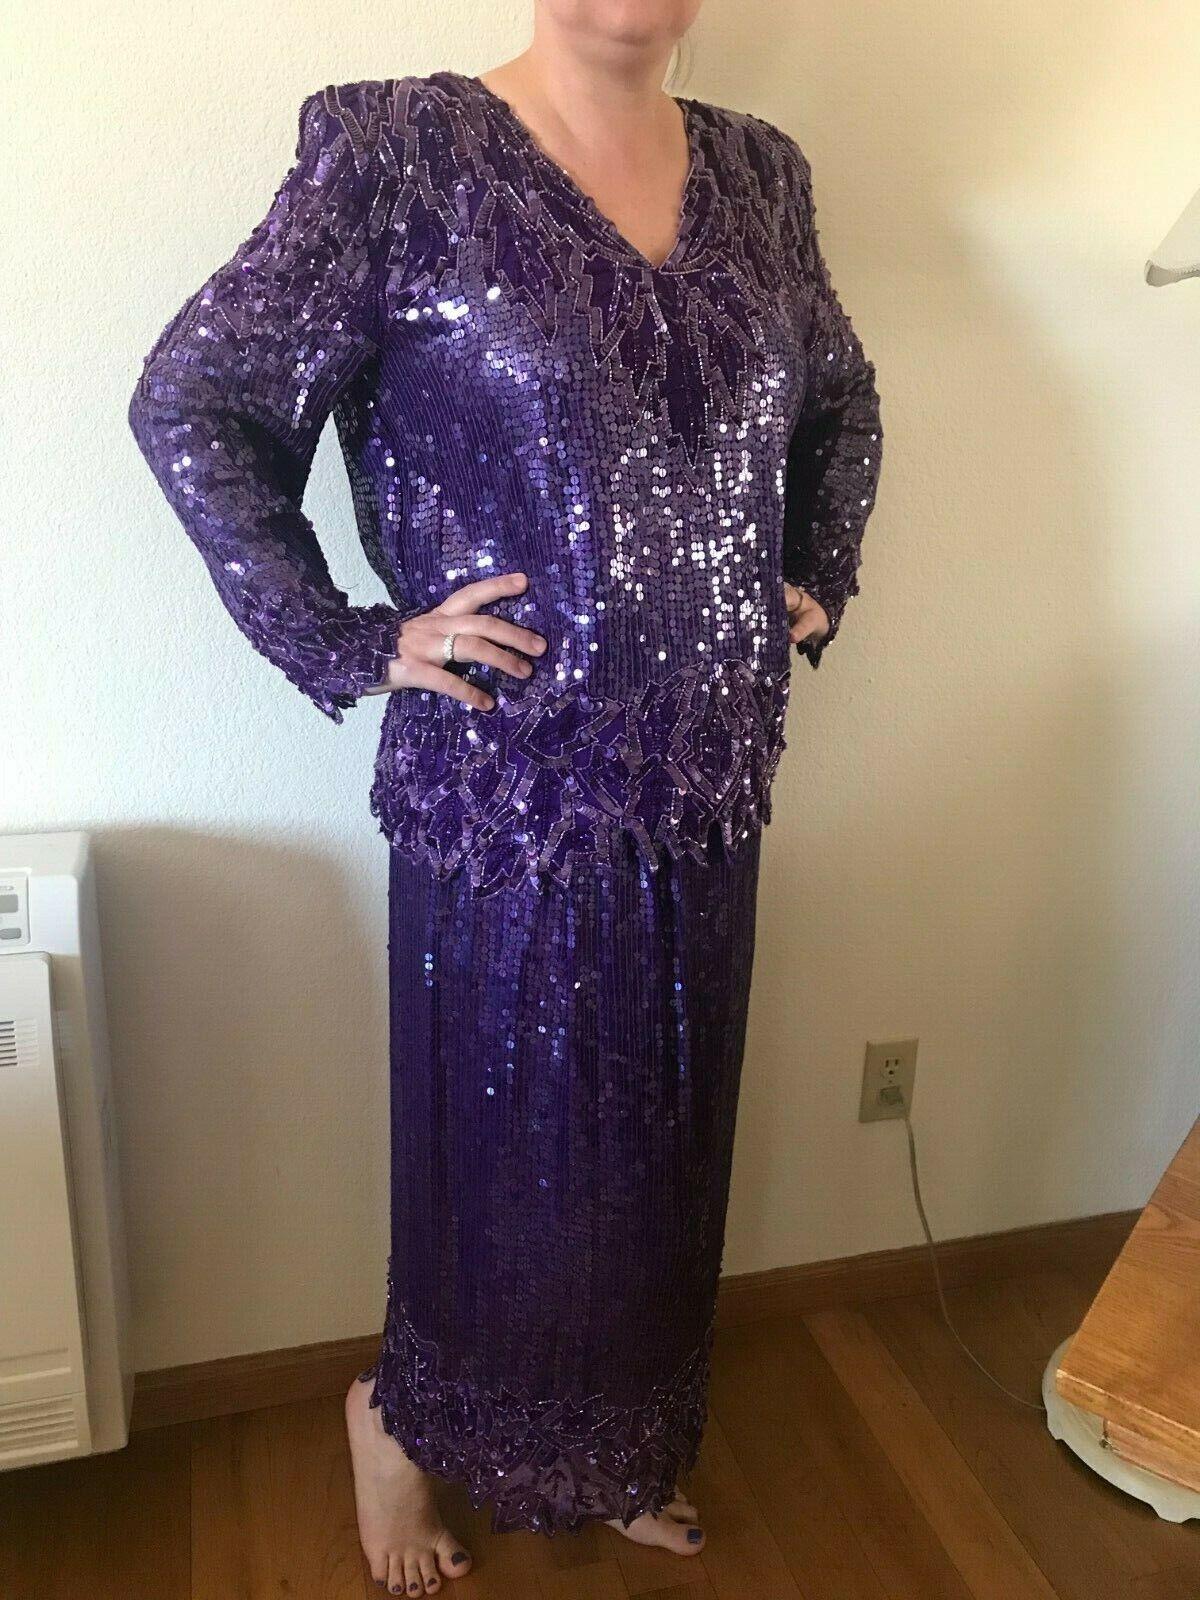 Scala Sequin Top & Matching Skirt - size XL, purple